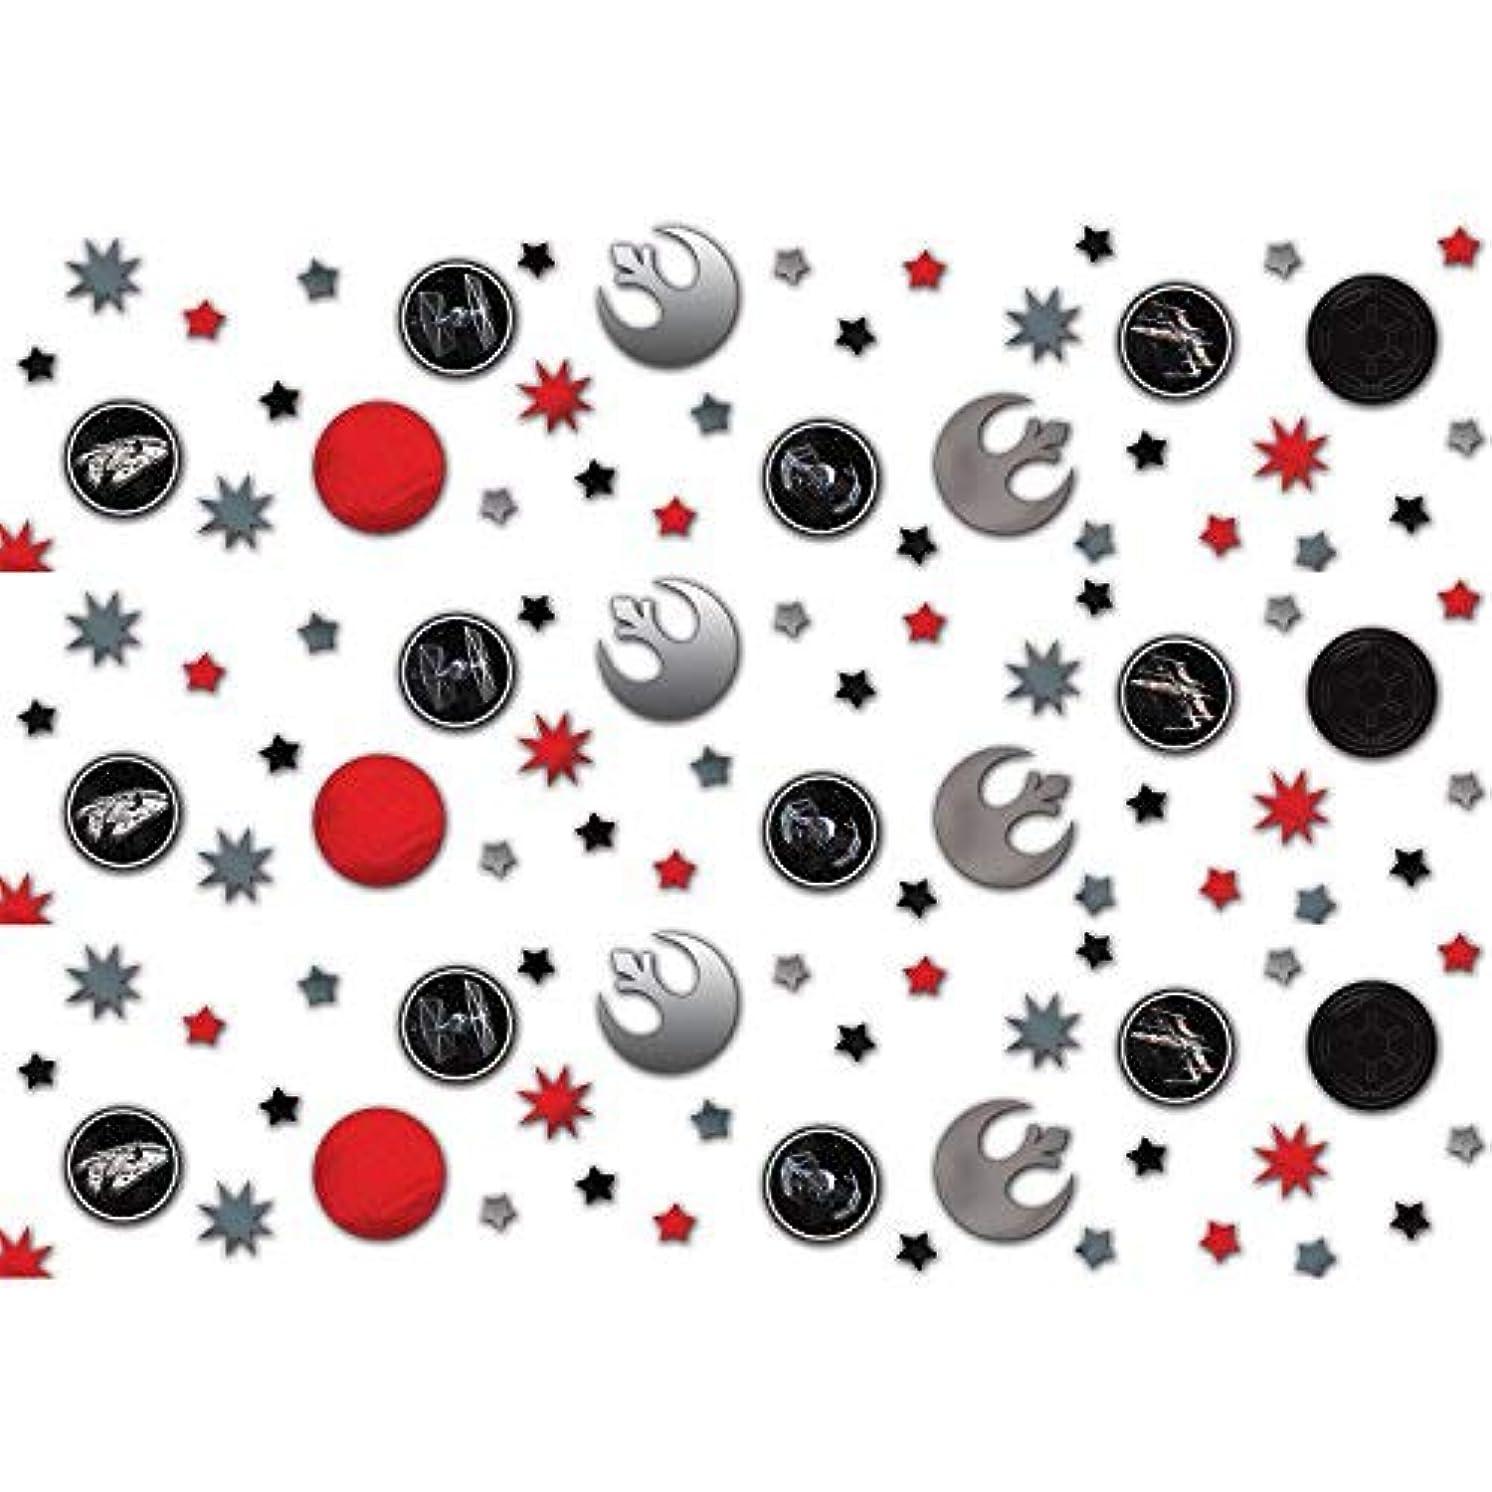 amscan International 9903088 Value 3pk Star Wars 3 Pack Confetti